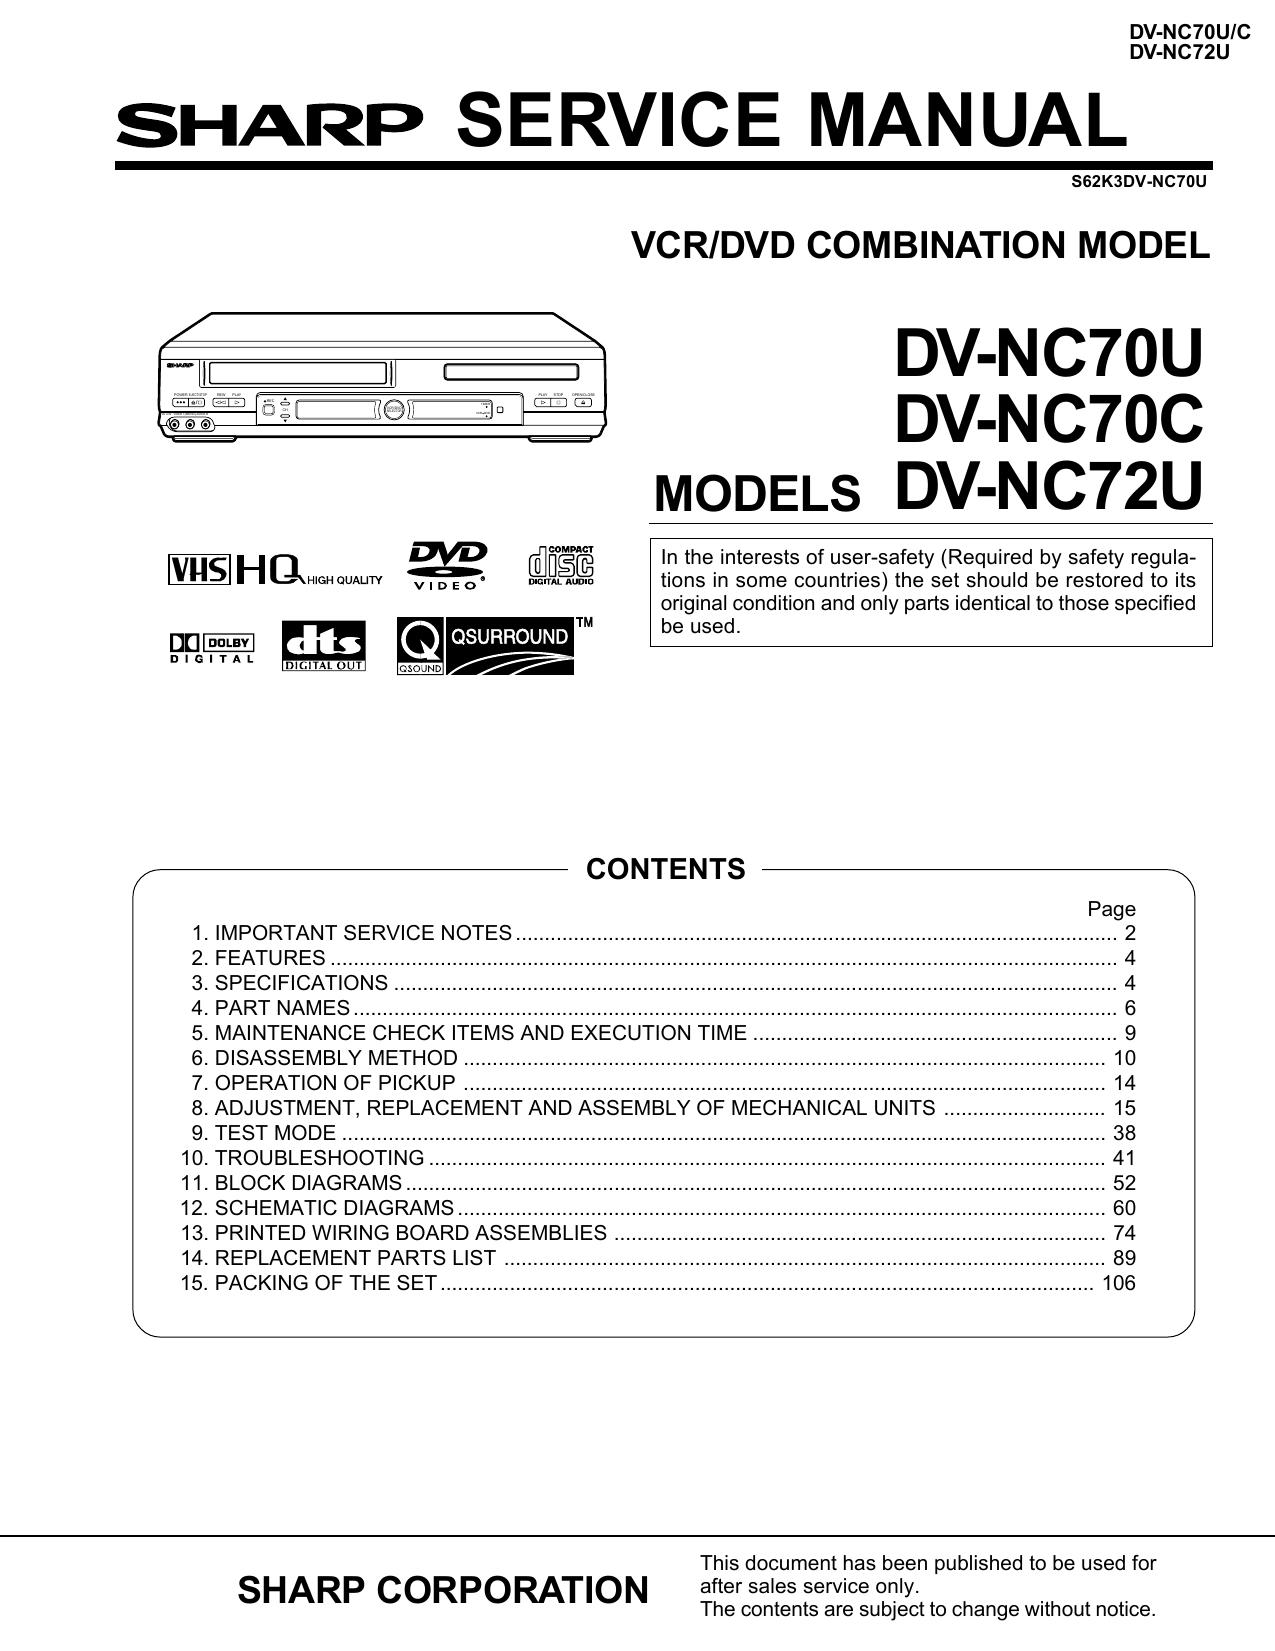 Sharp DV-NC70U Service manual | manualzz.com on